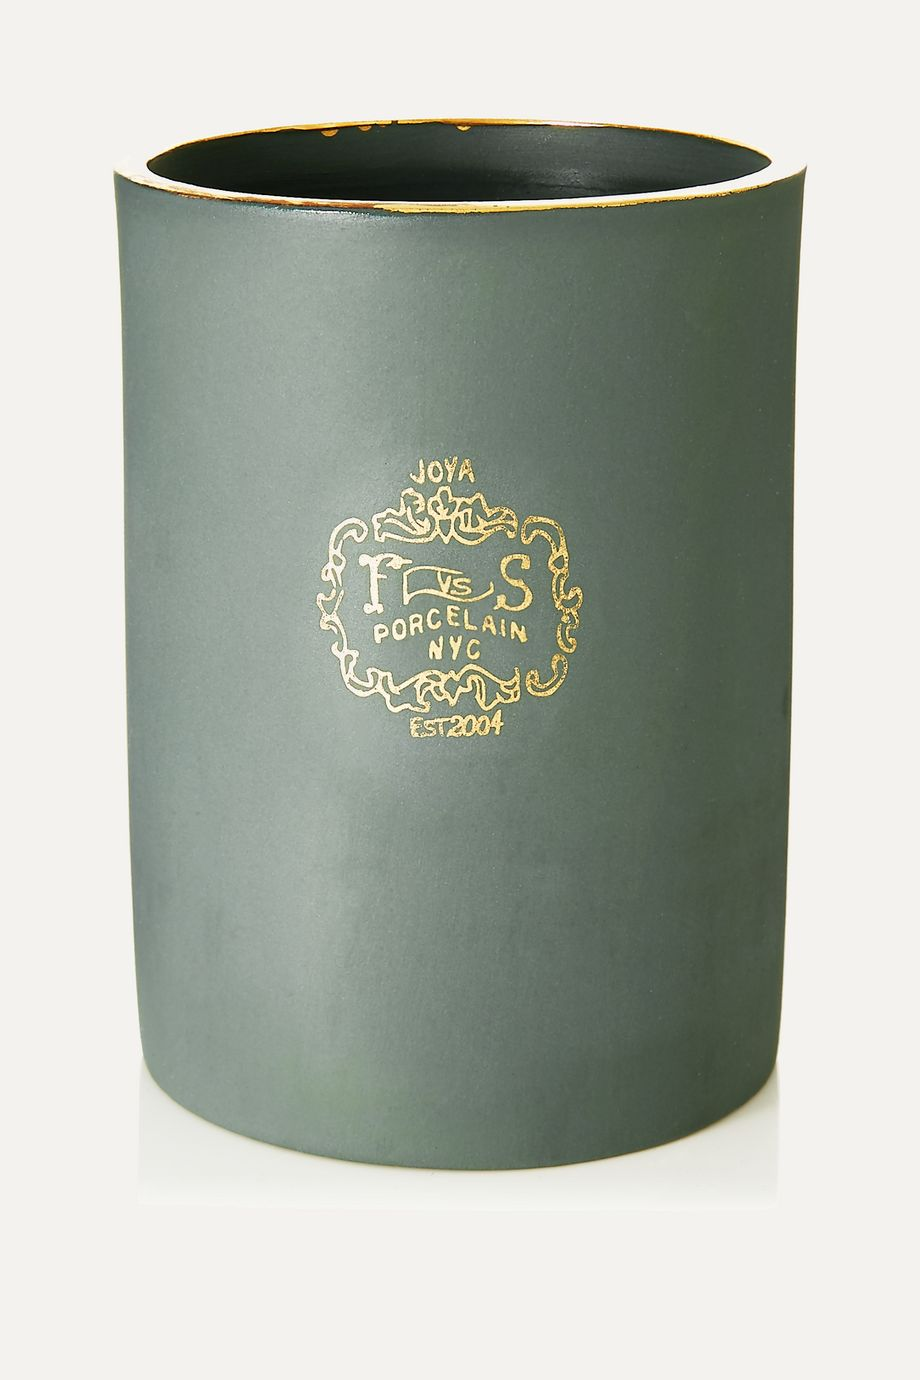 Joya Foxglove scented candle, 260g